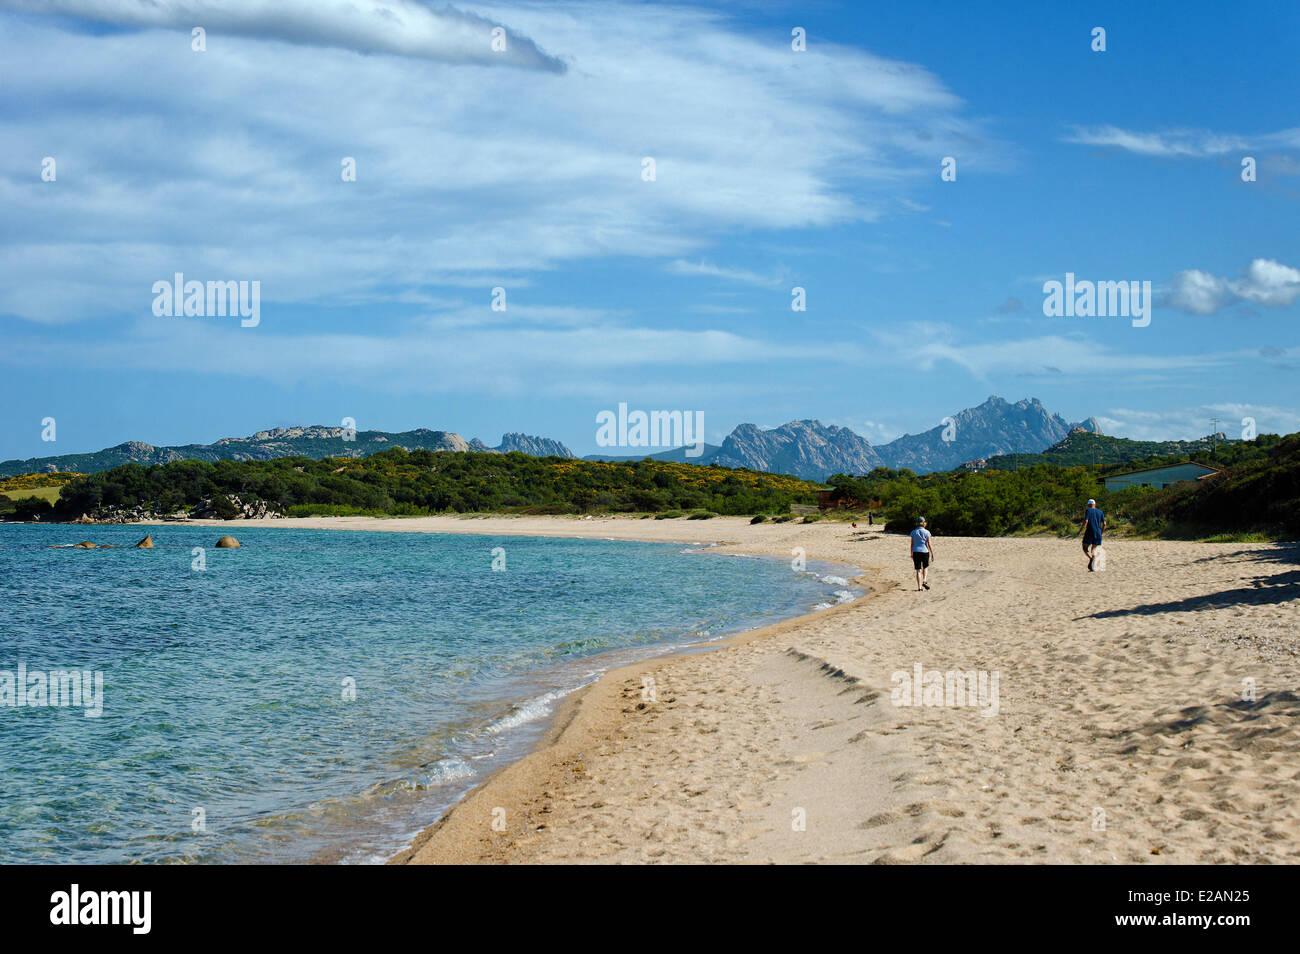 Italy, Sardinia, Olbia Tempio Province, the Emerald Coast (Costa Smeralda), Gulf of Arzachena, Tanca Manna, Mannena - Stock Image